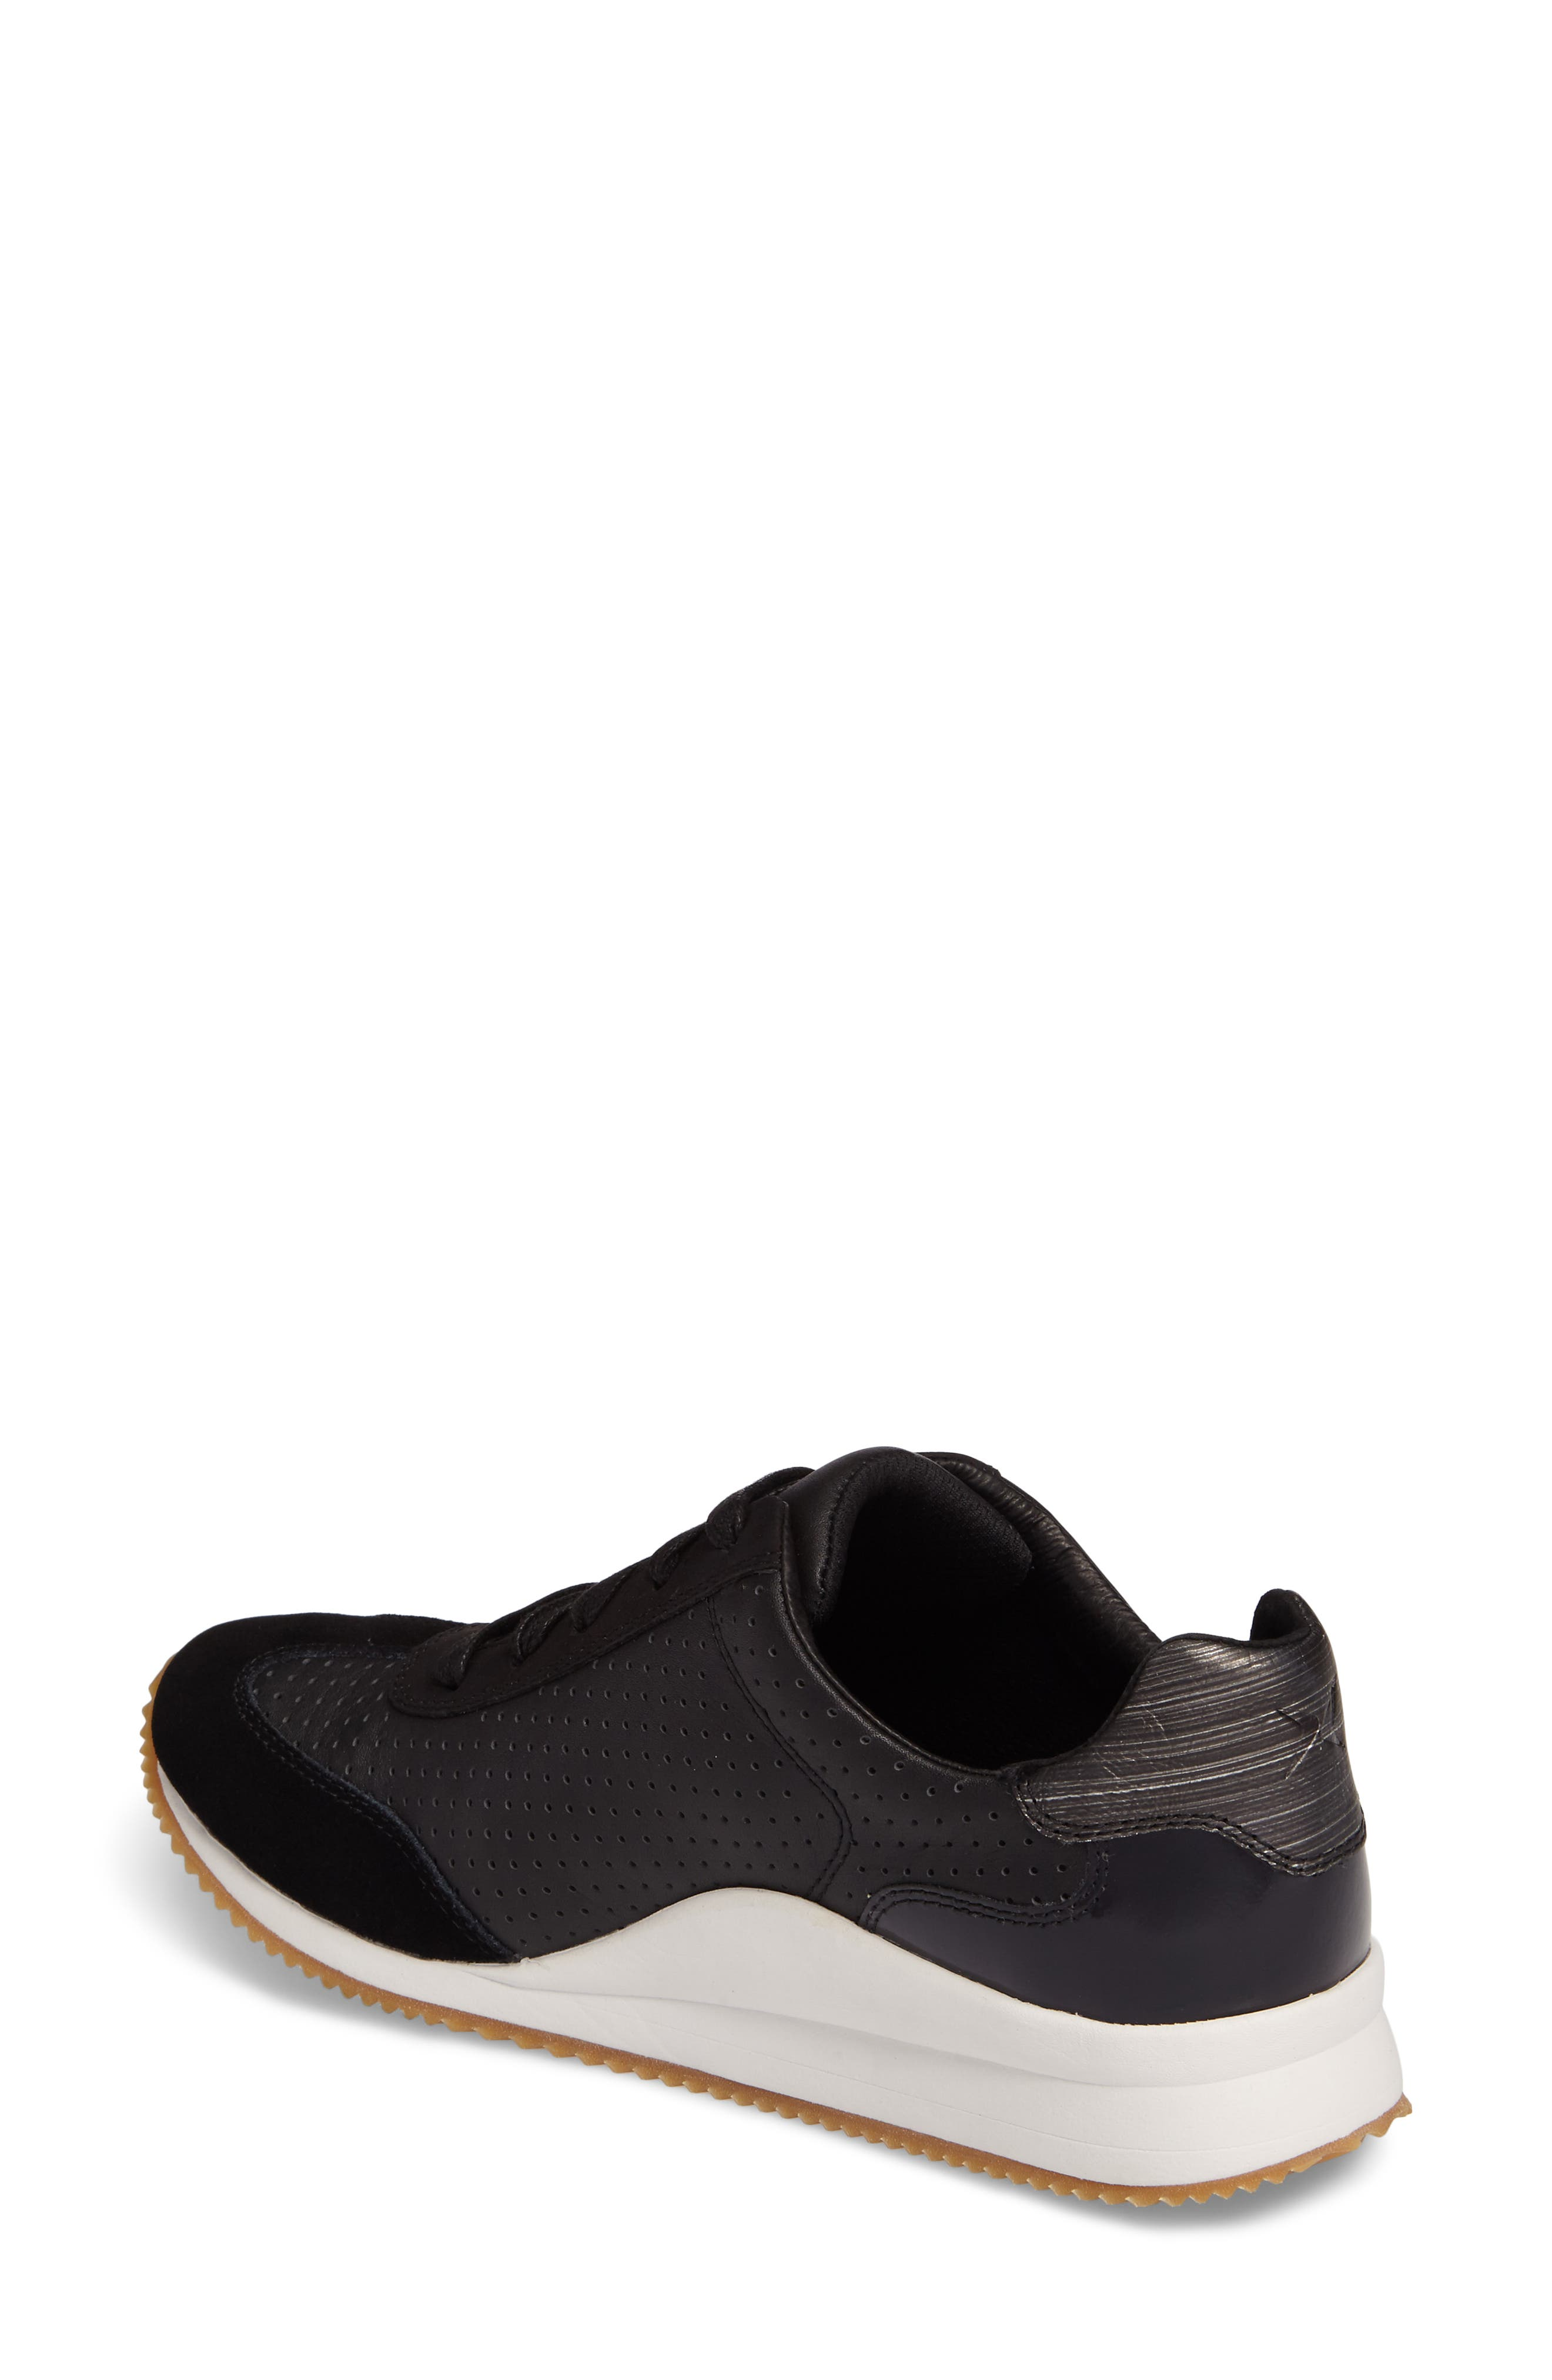 Nadia Sneaker,                             Alternate thumbnail 2, color,                             BLACK LEATHER